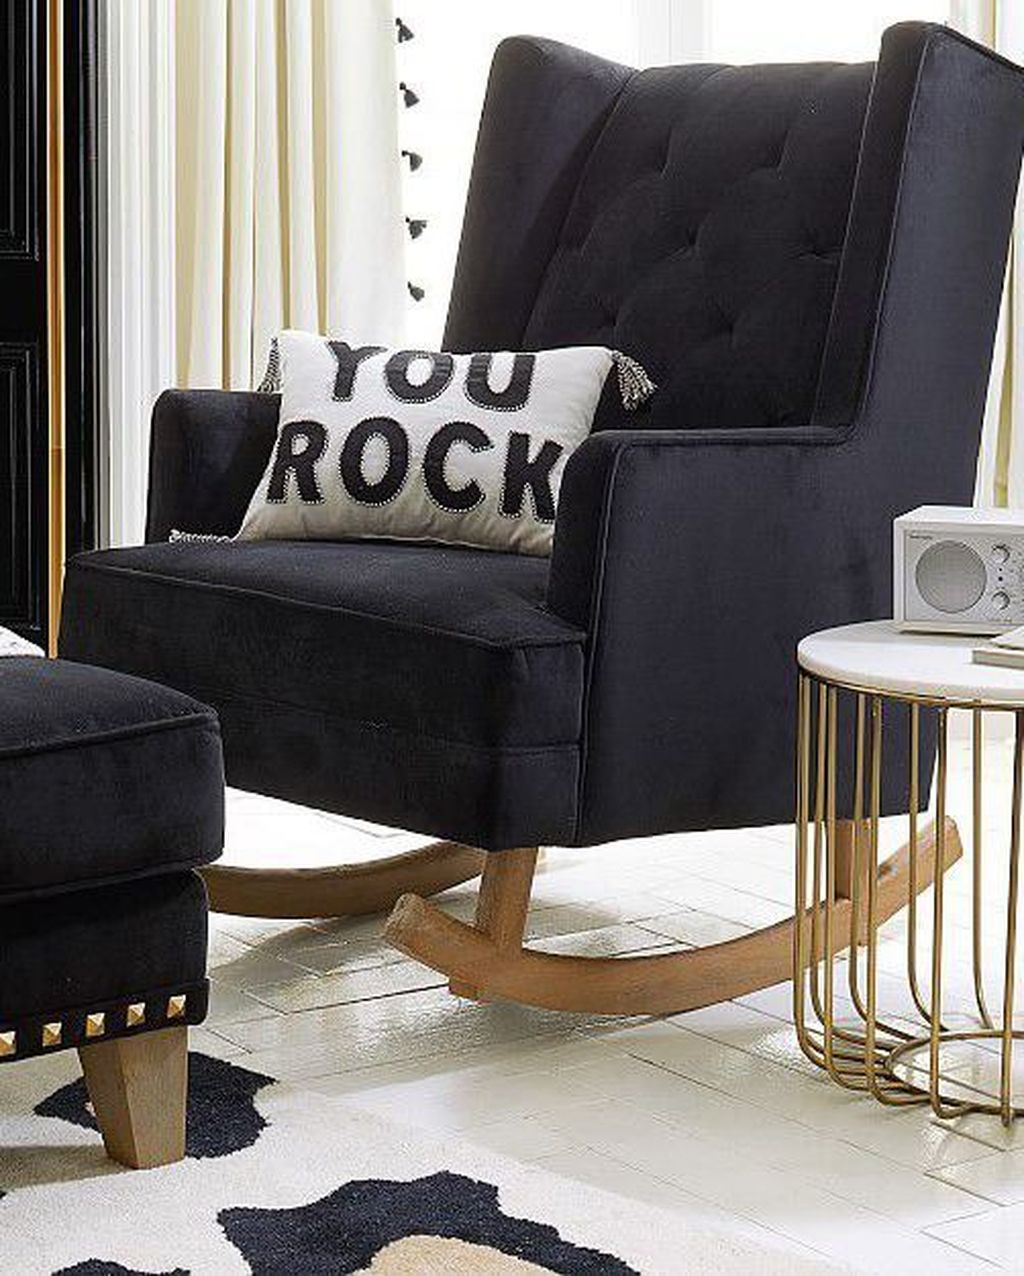 Amazing Rocking Chair Design Ideas 13